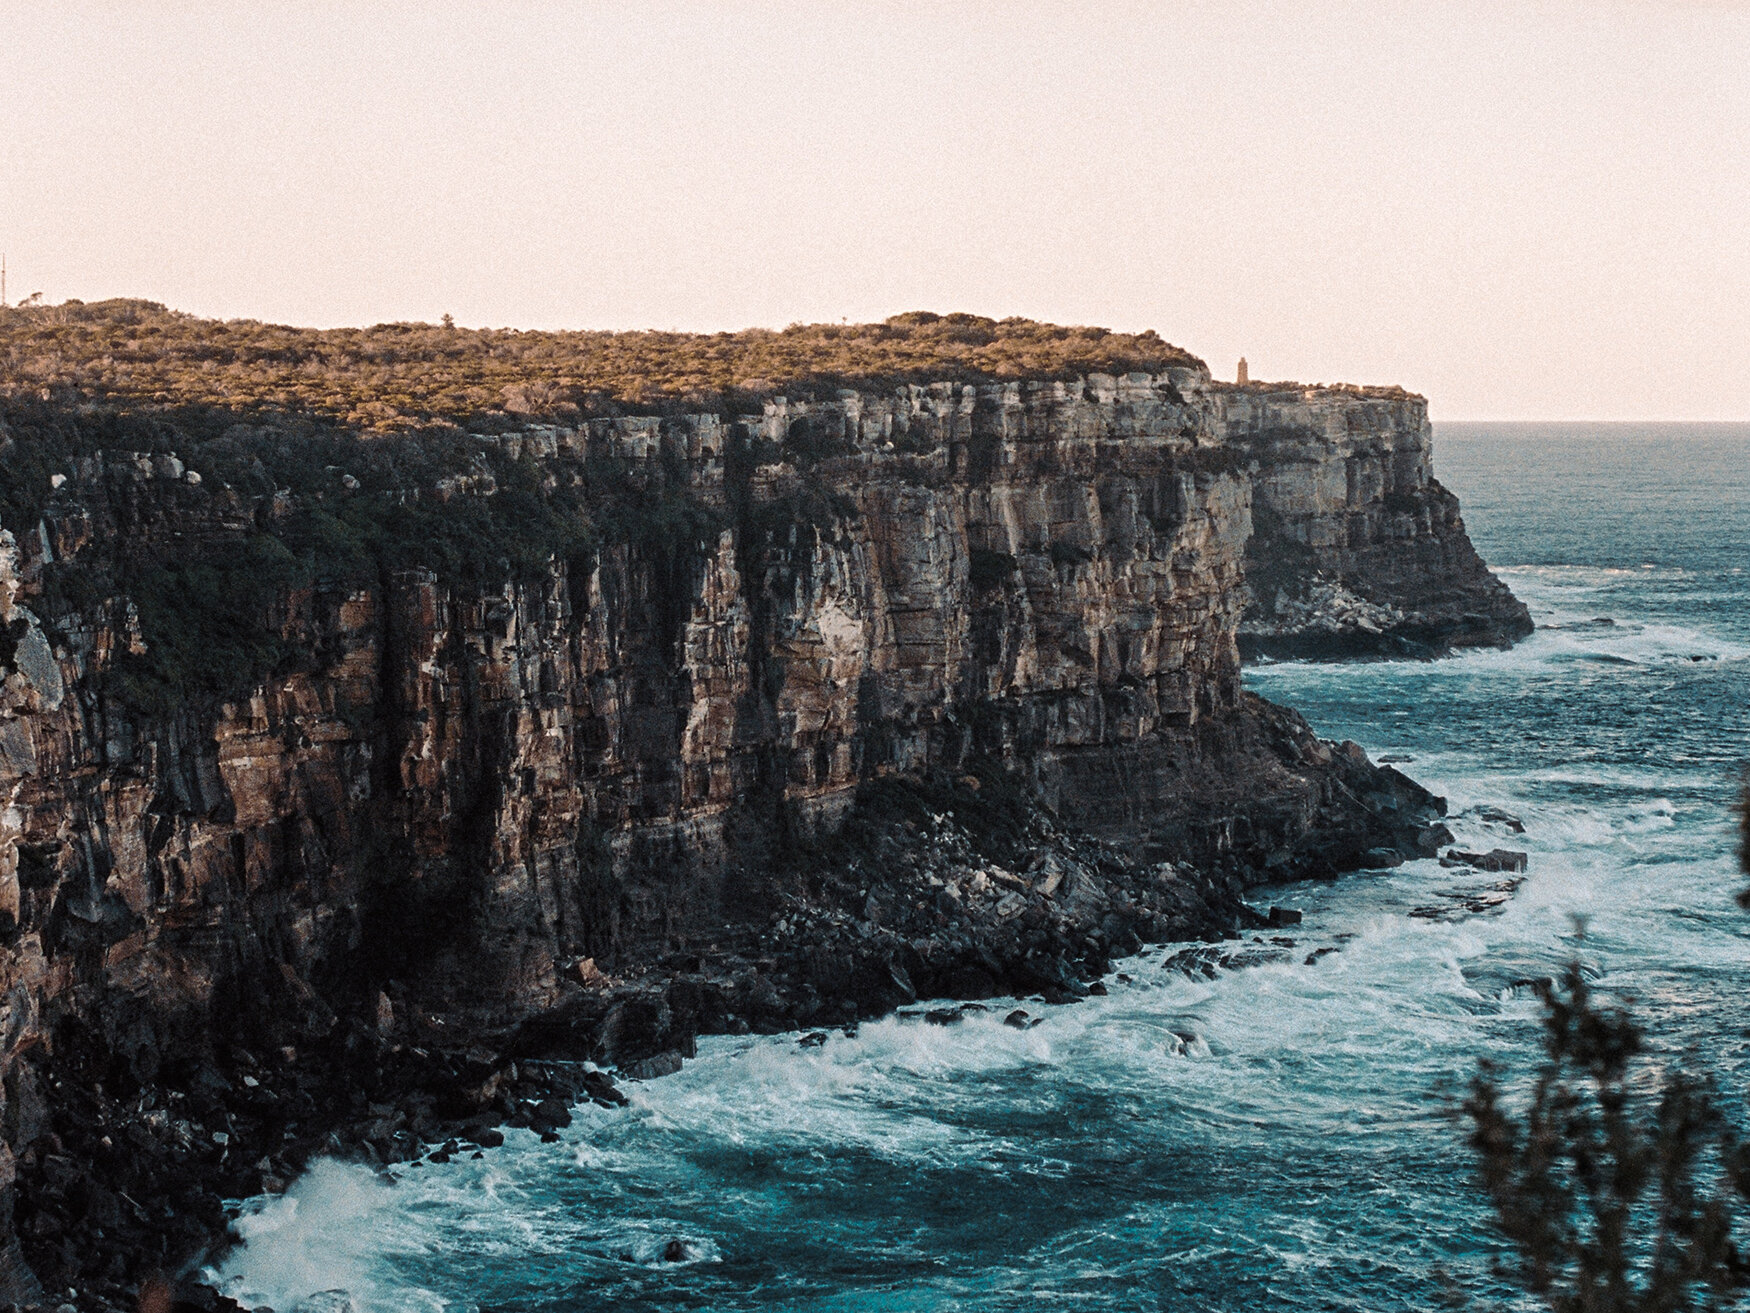 Cliffs 4 3.jpg